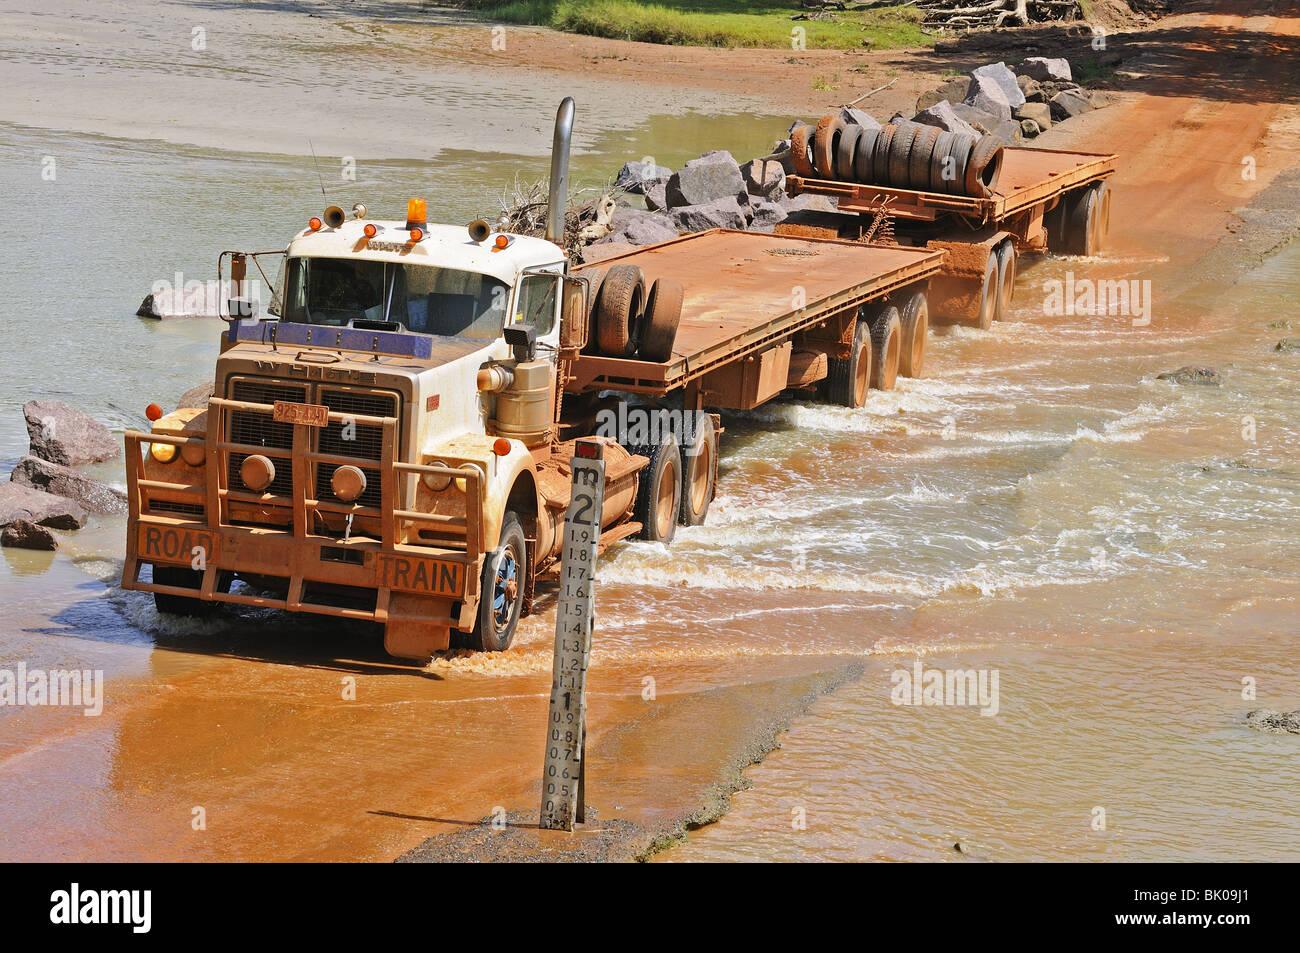 Road train fording East Alligator River Crossing (Cahills Crossing)   Kakadu  National   Park Northern Territory, - Stock Image